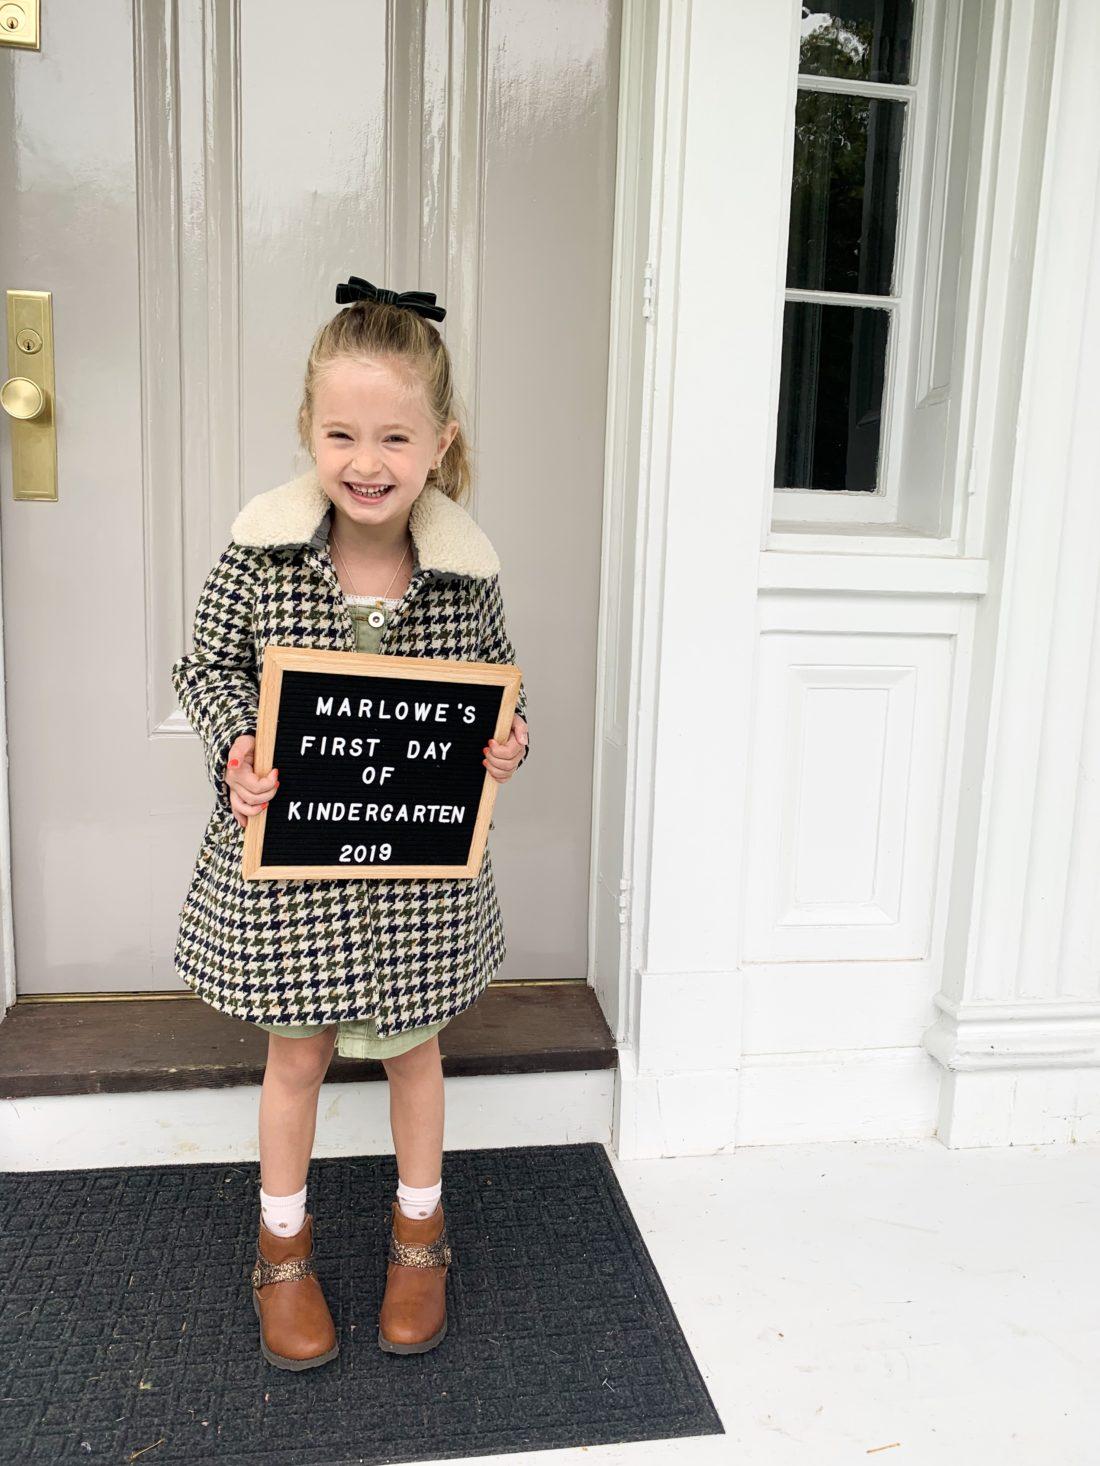 Marlowe Martino on her first day of Kindergarten